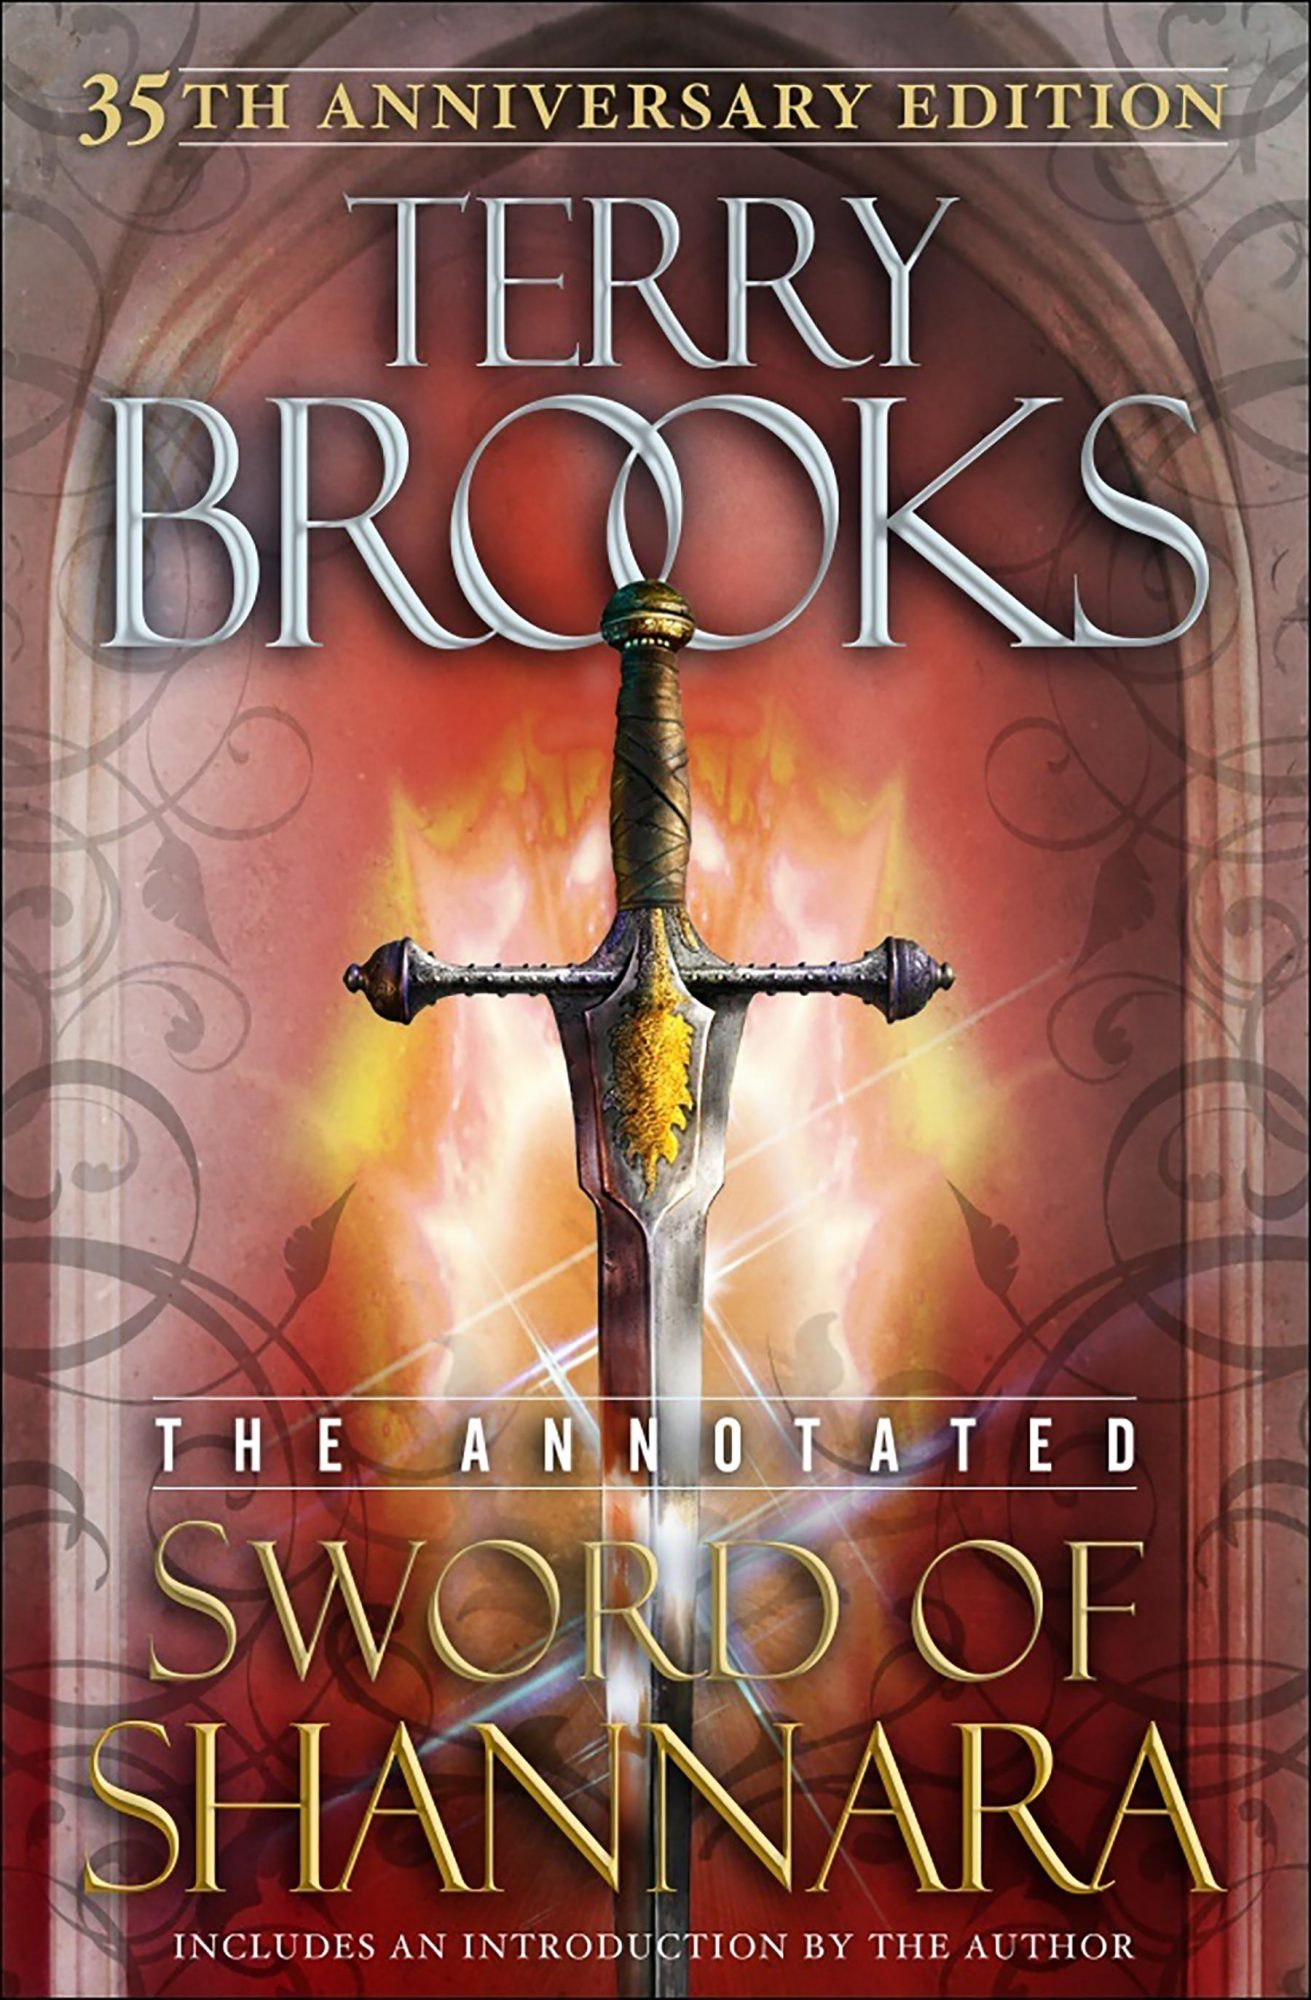 Terry Brooks, Sword of Shannara